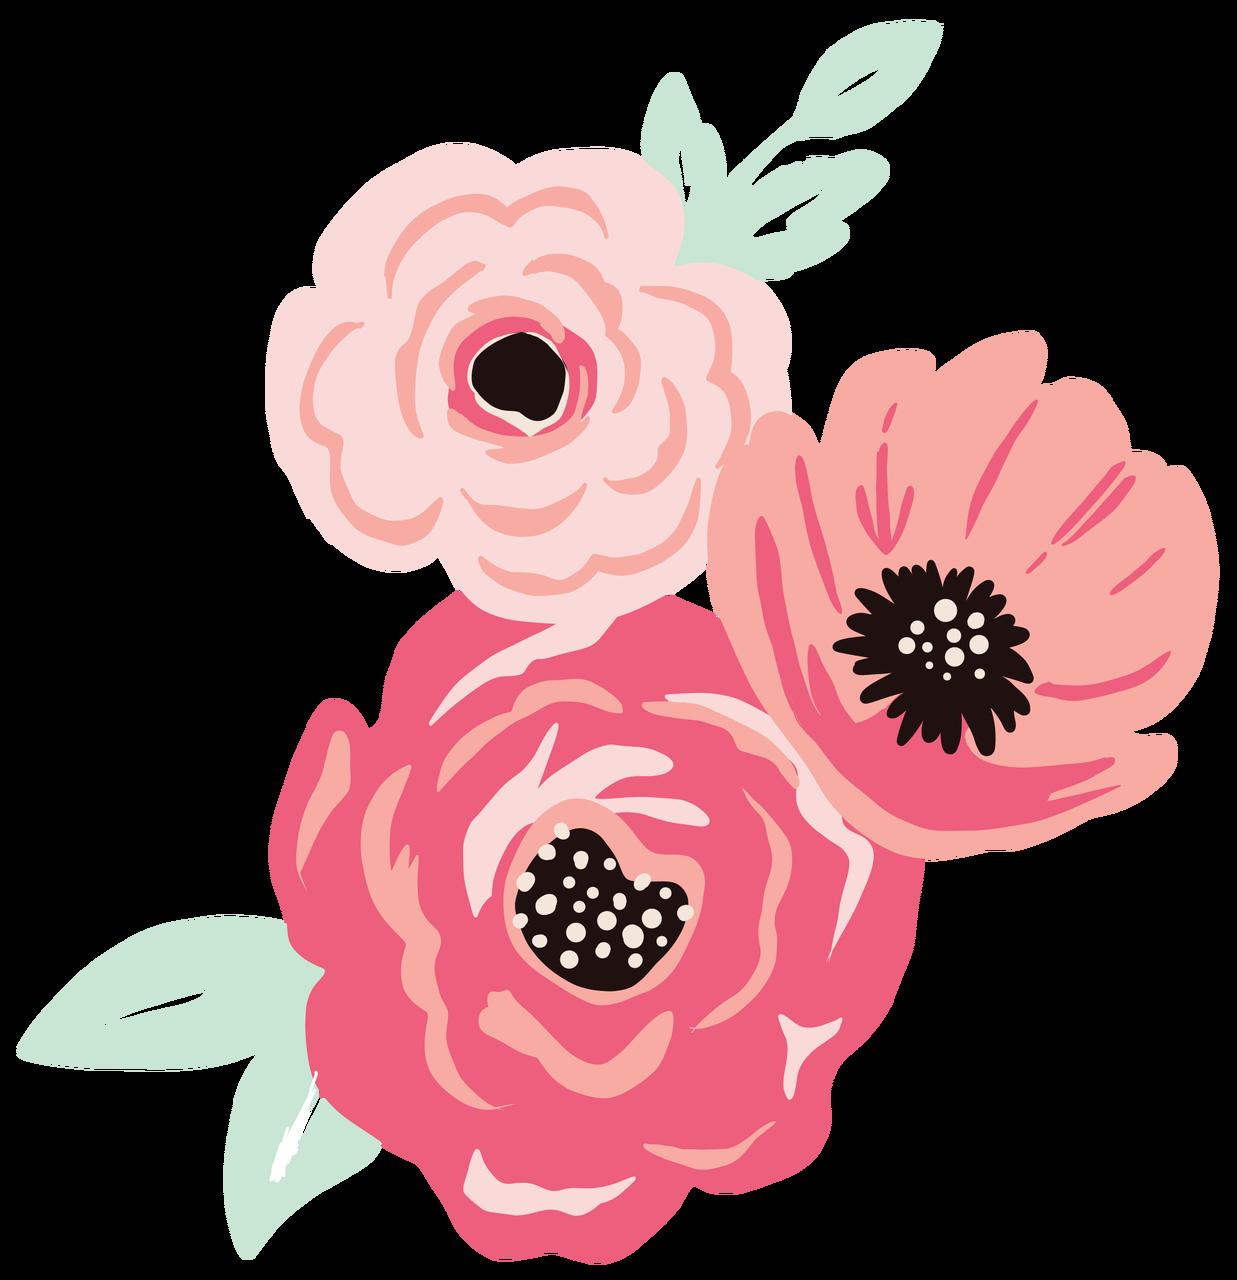 Flower Bunch Print & Cut File